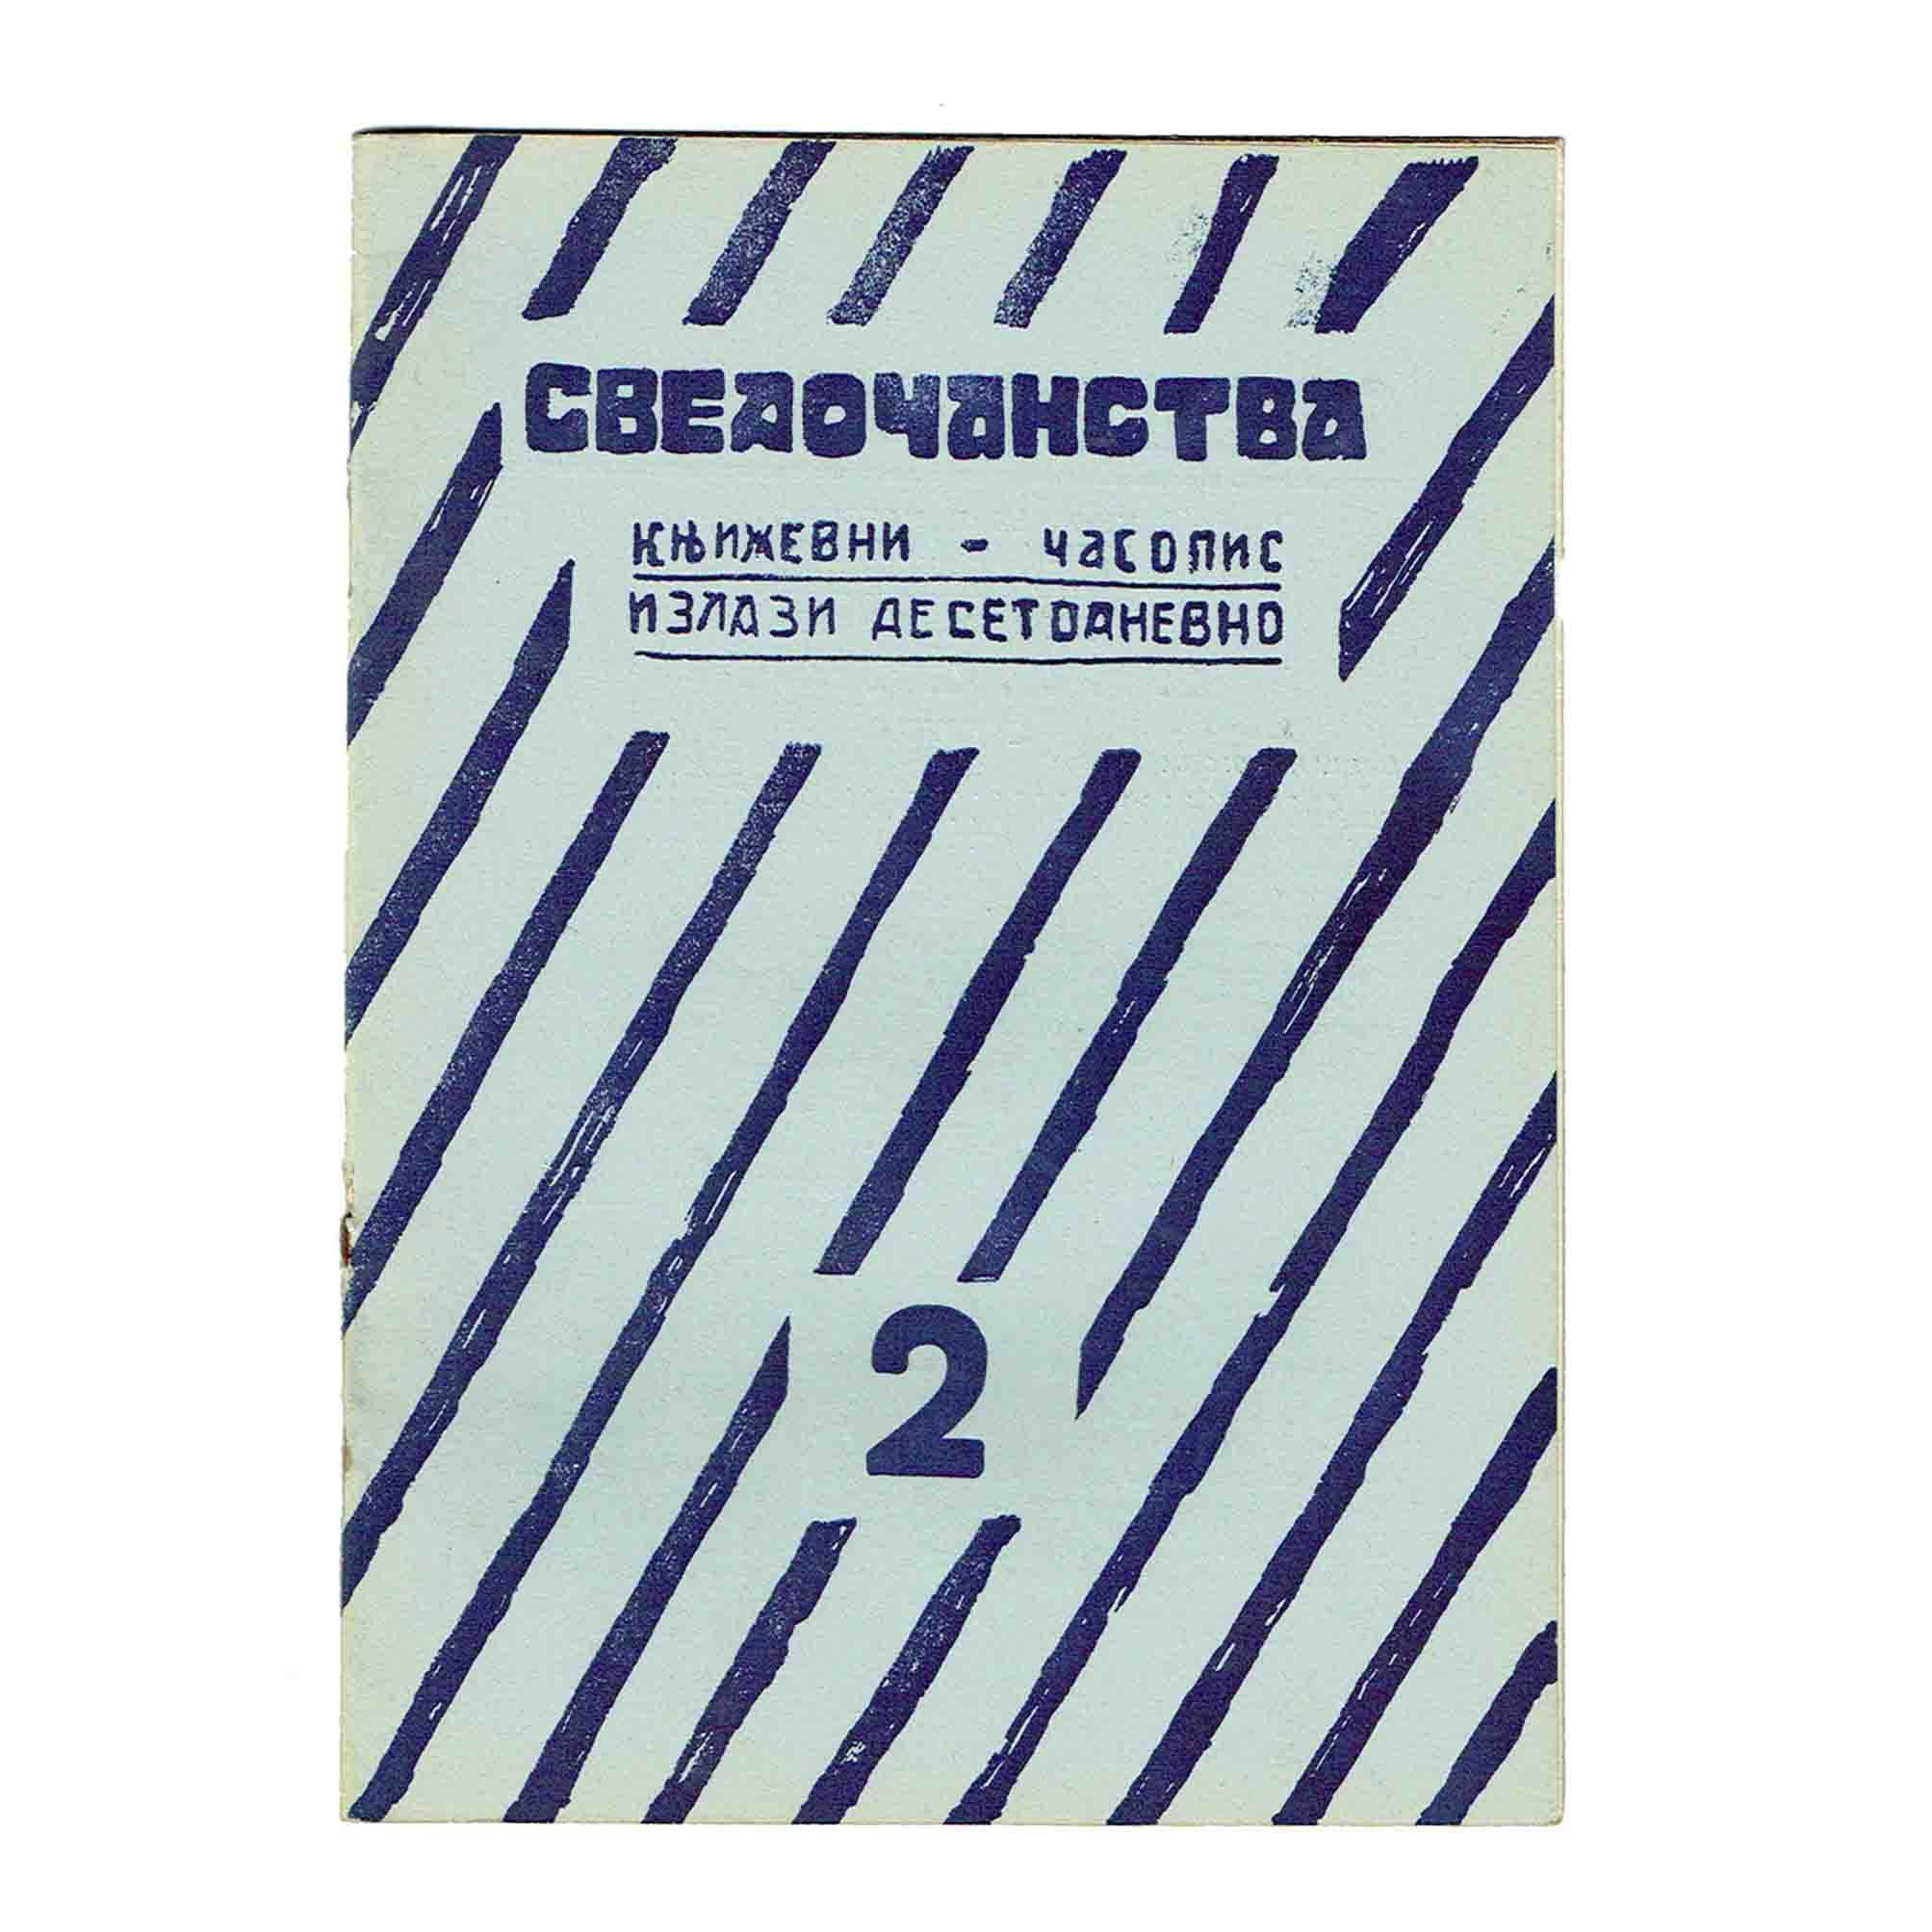 Svedocanstva-2-1924-Cover-recto-frei-N.jpeg